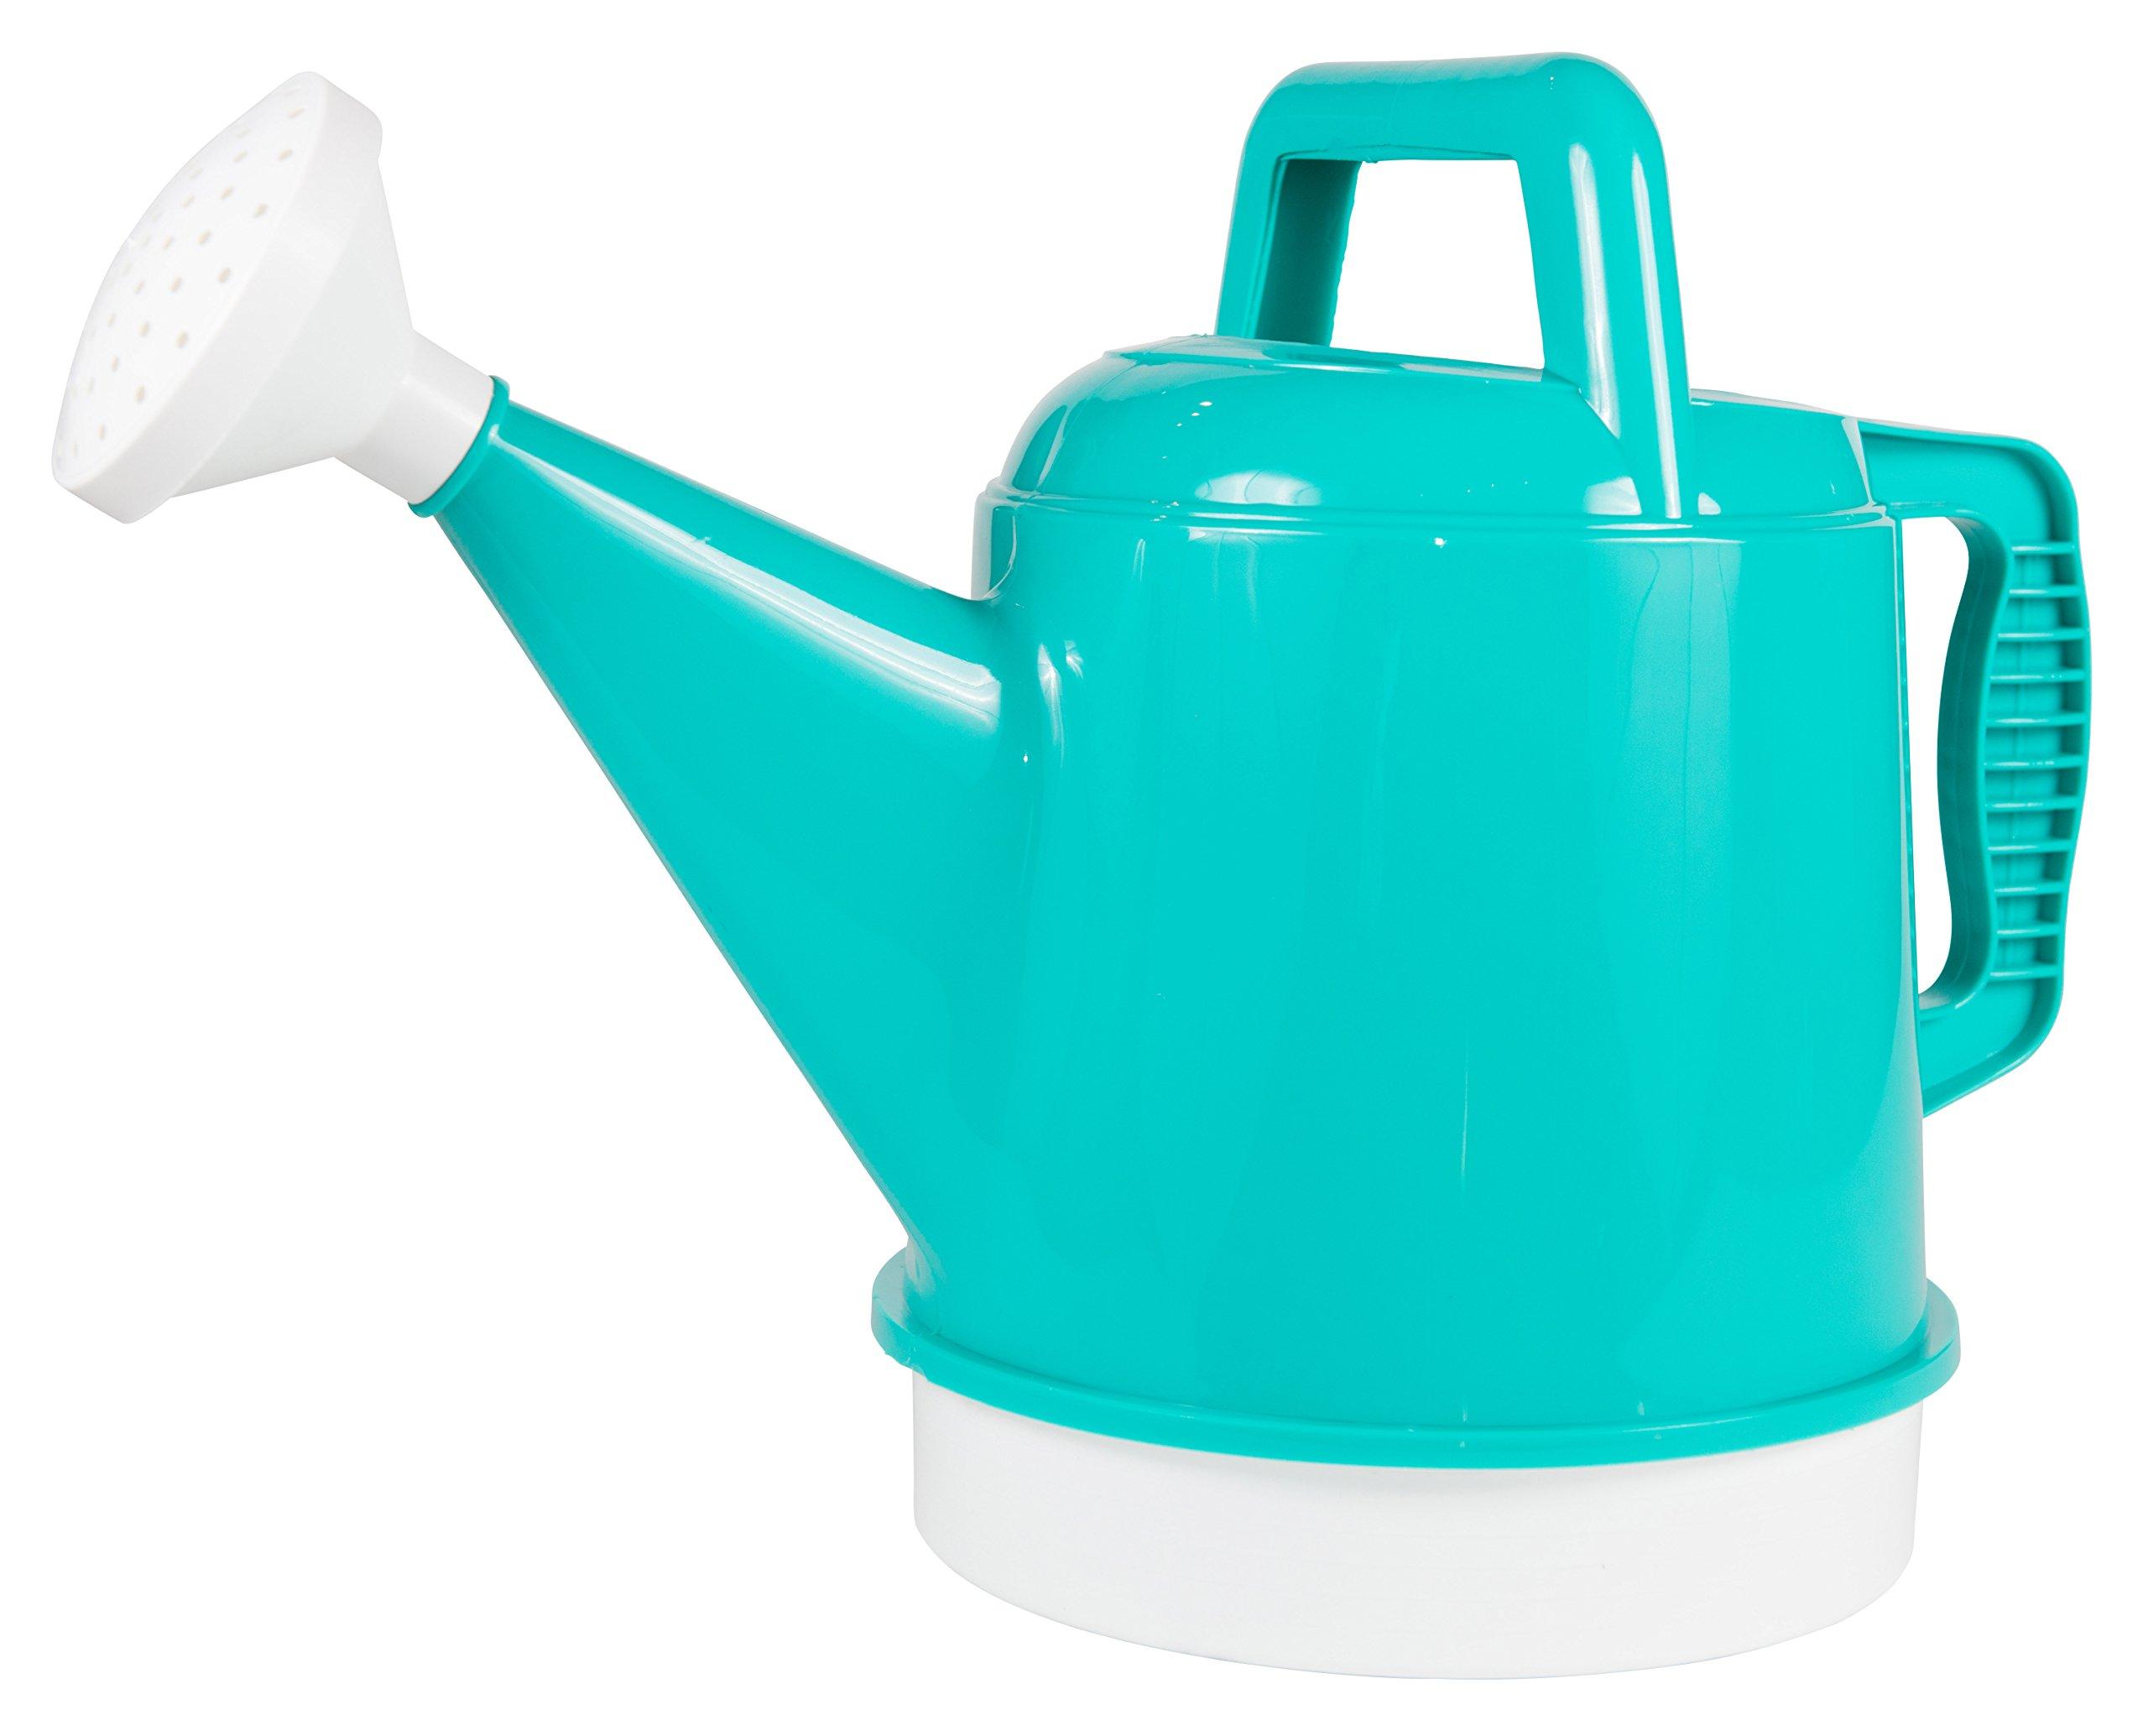 Bloem Deluxe Watering Can, 2.5 Gallon, Calypso (DWC2-27)